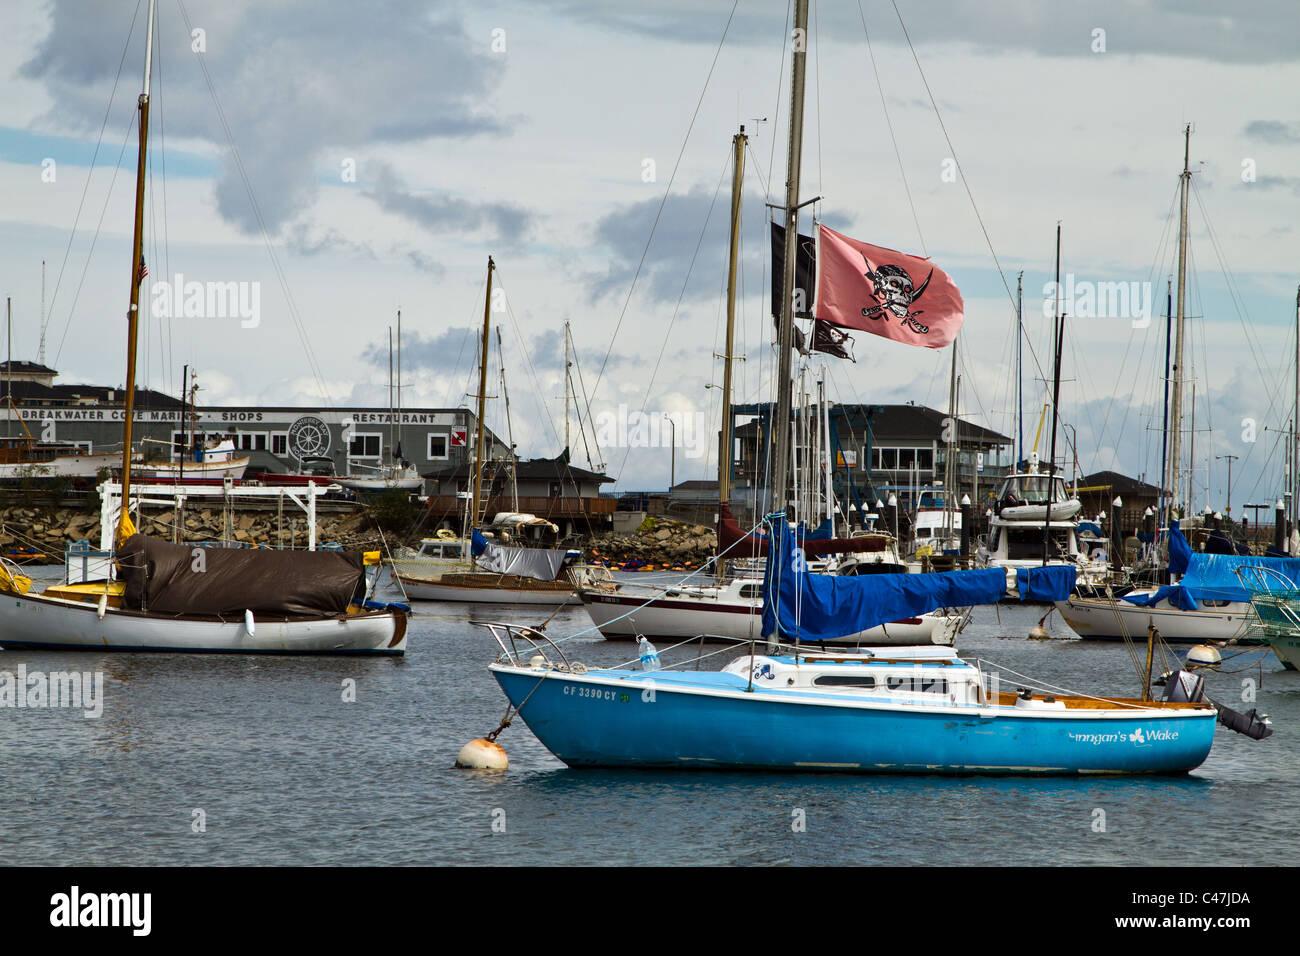 Sailboat with pirate flag hanging - Monterey Bay, Calfiornia - Stock Image